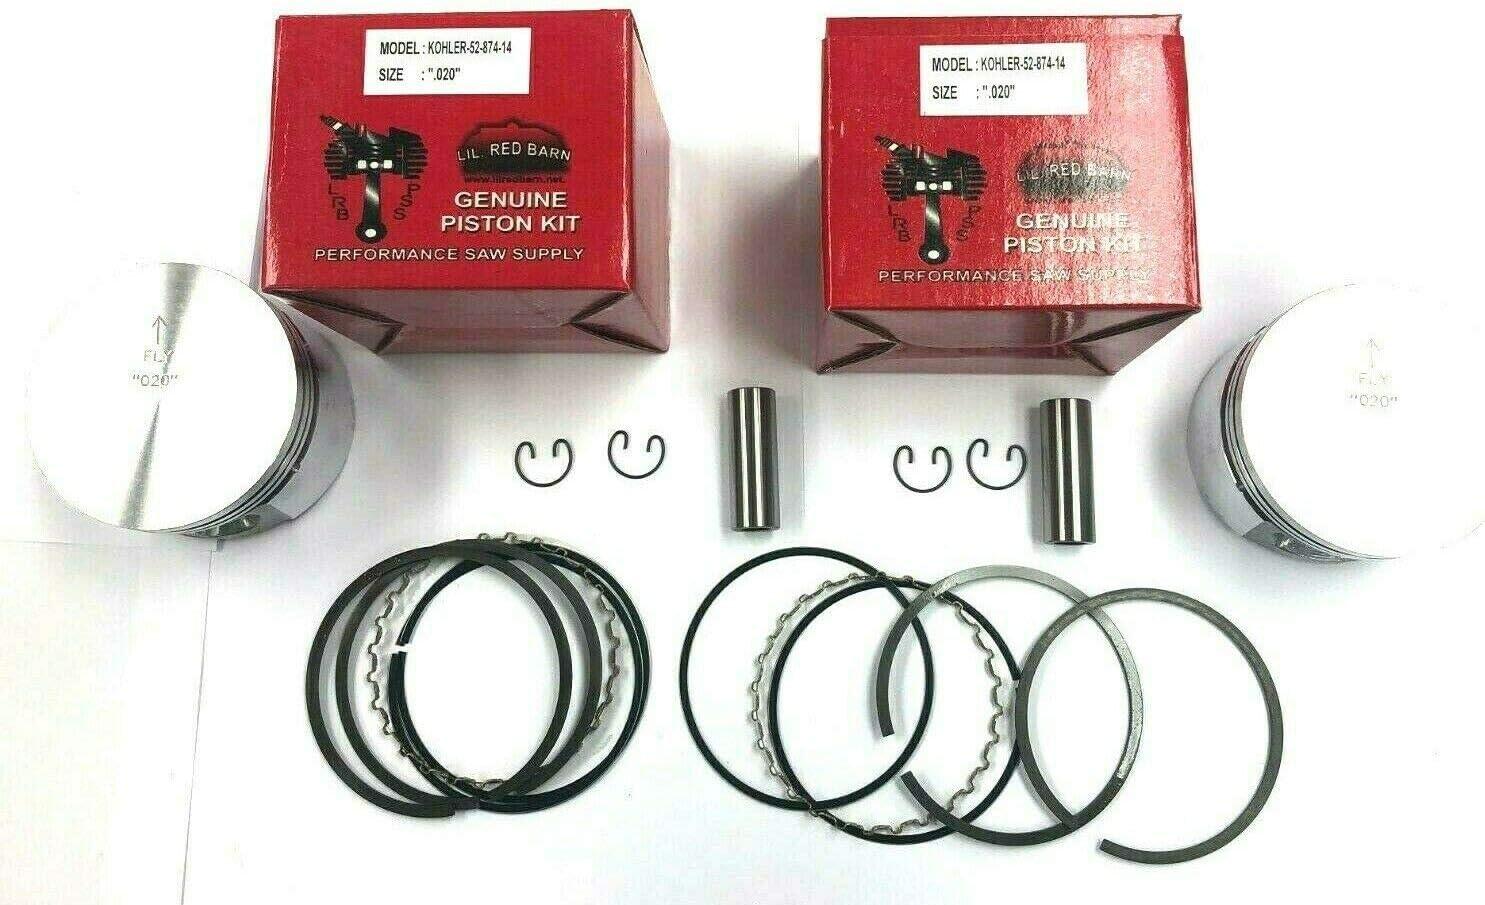 Challenge the lowest price of Japan Lil Red Barn Piston Kit Fits Kohler New mail order KT17 MV18 Repla MV16 M18